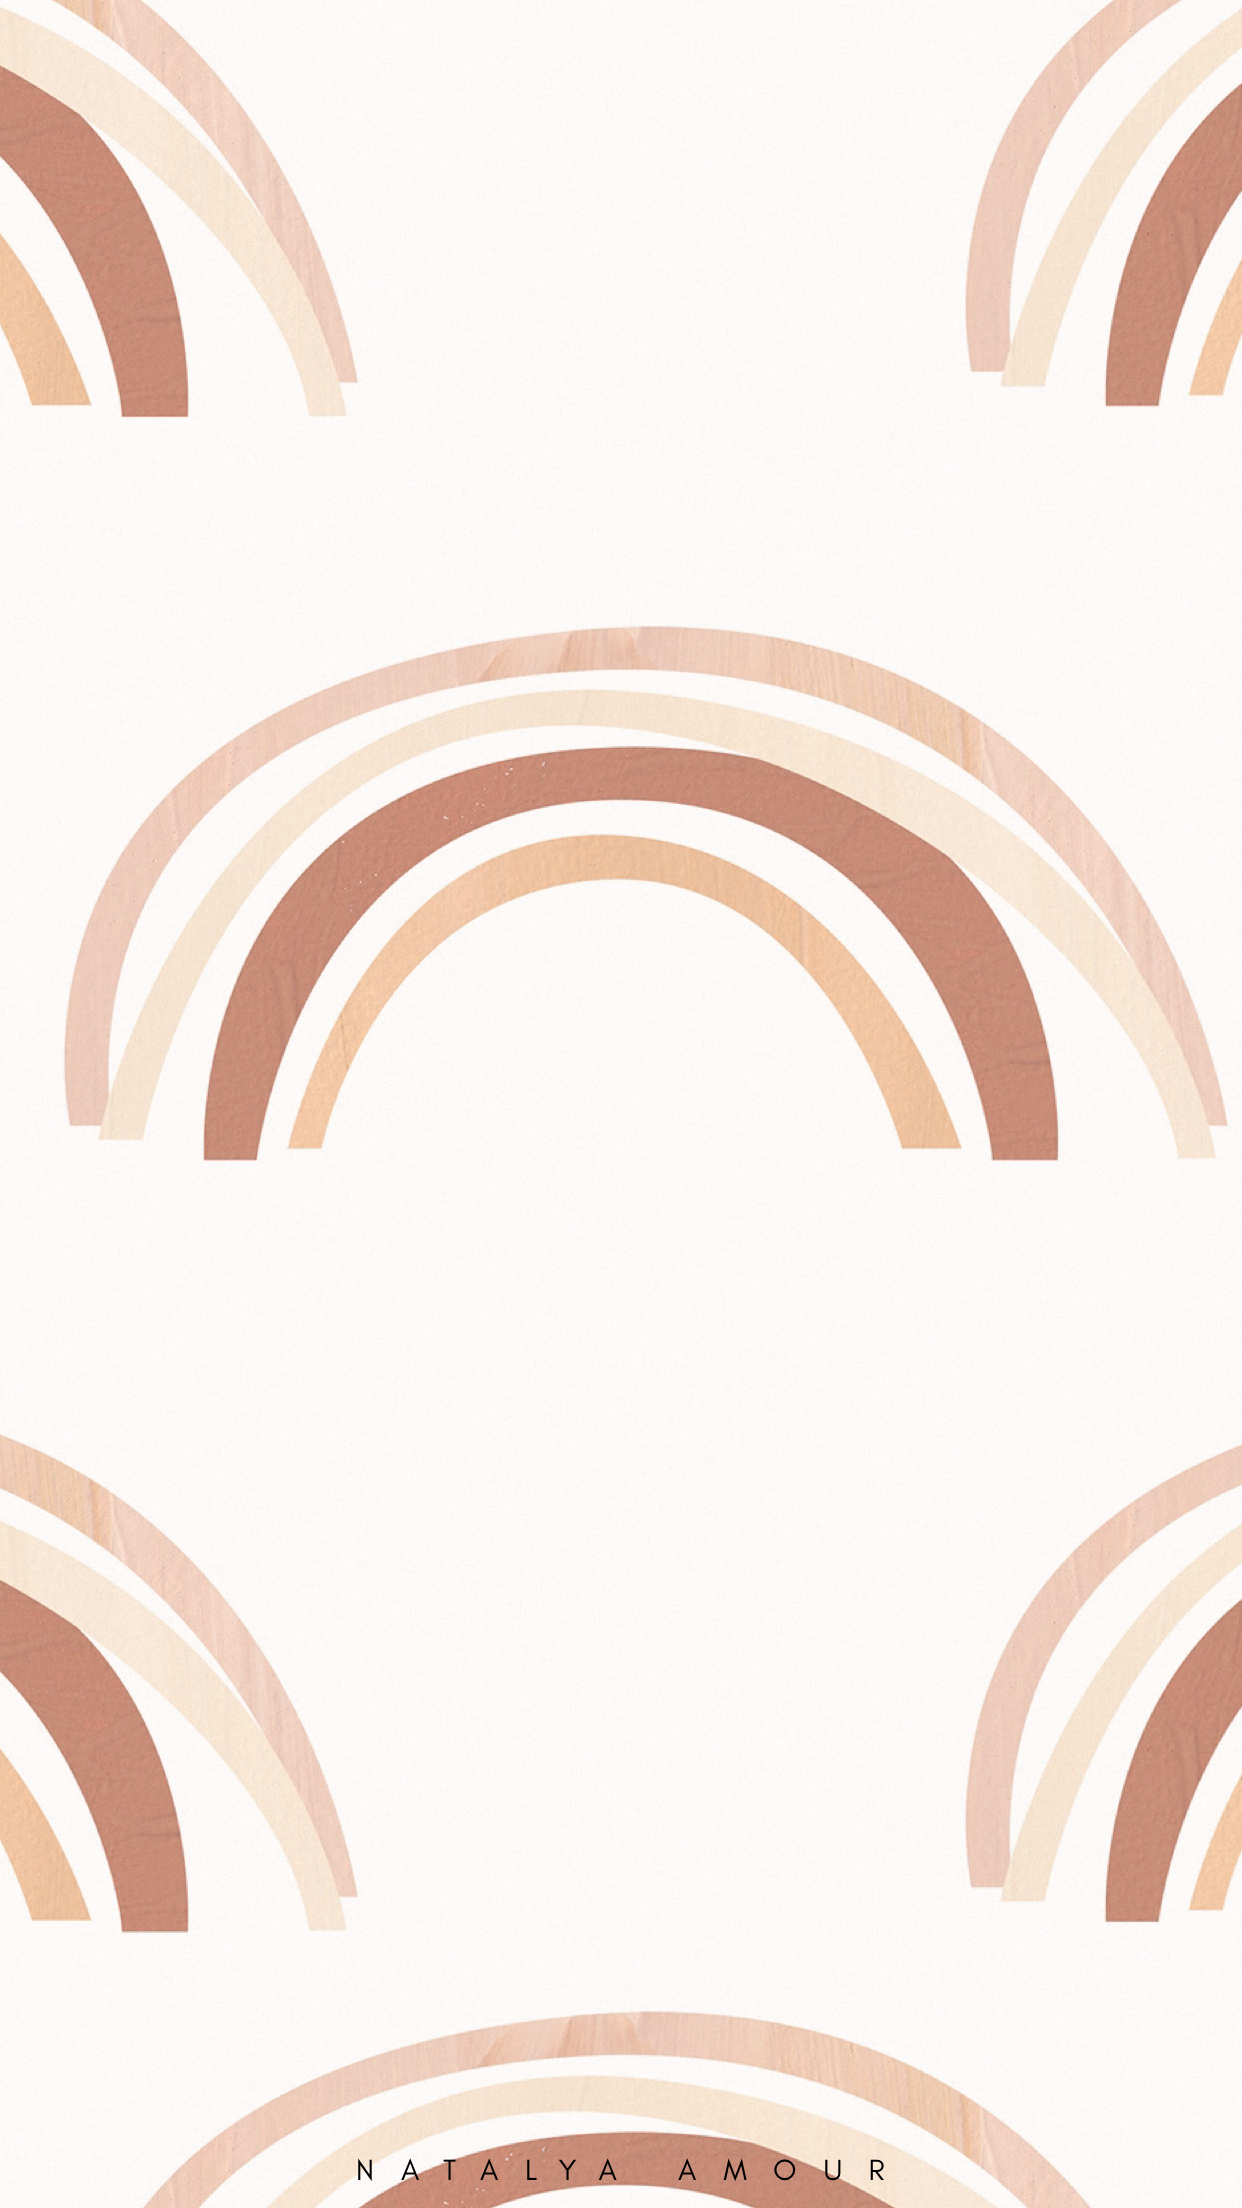 New Blog Post On Natalyaamour Com January Desktop Wallpaper Iphone Boho Boho Wallpaper Rainbow Wallpaper